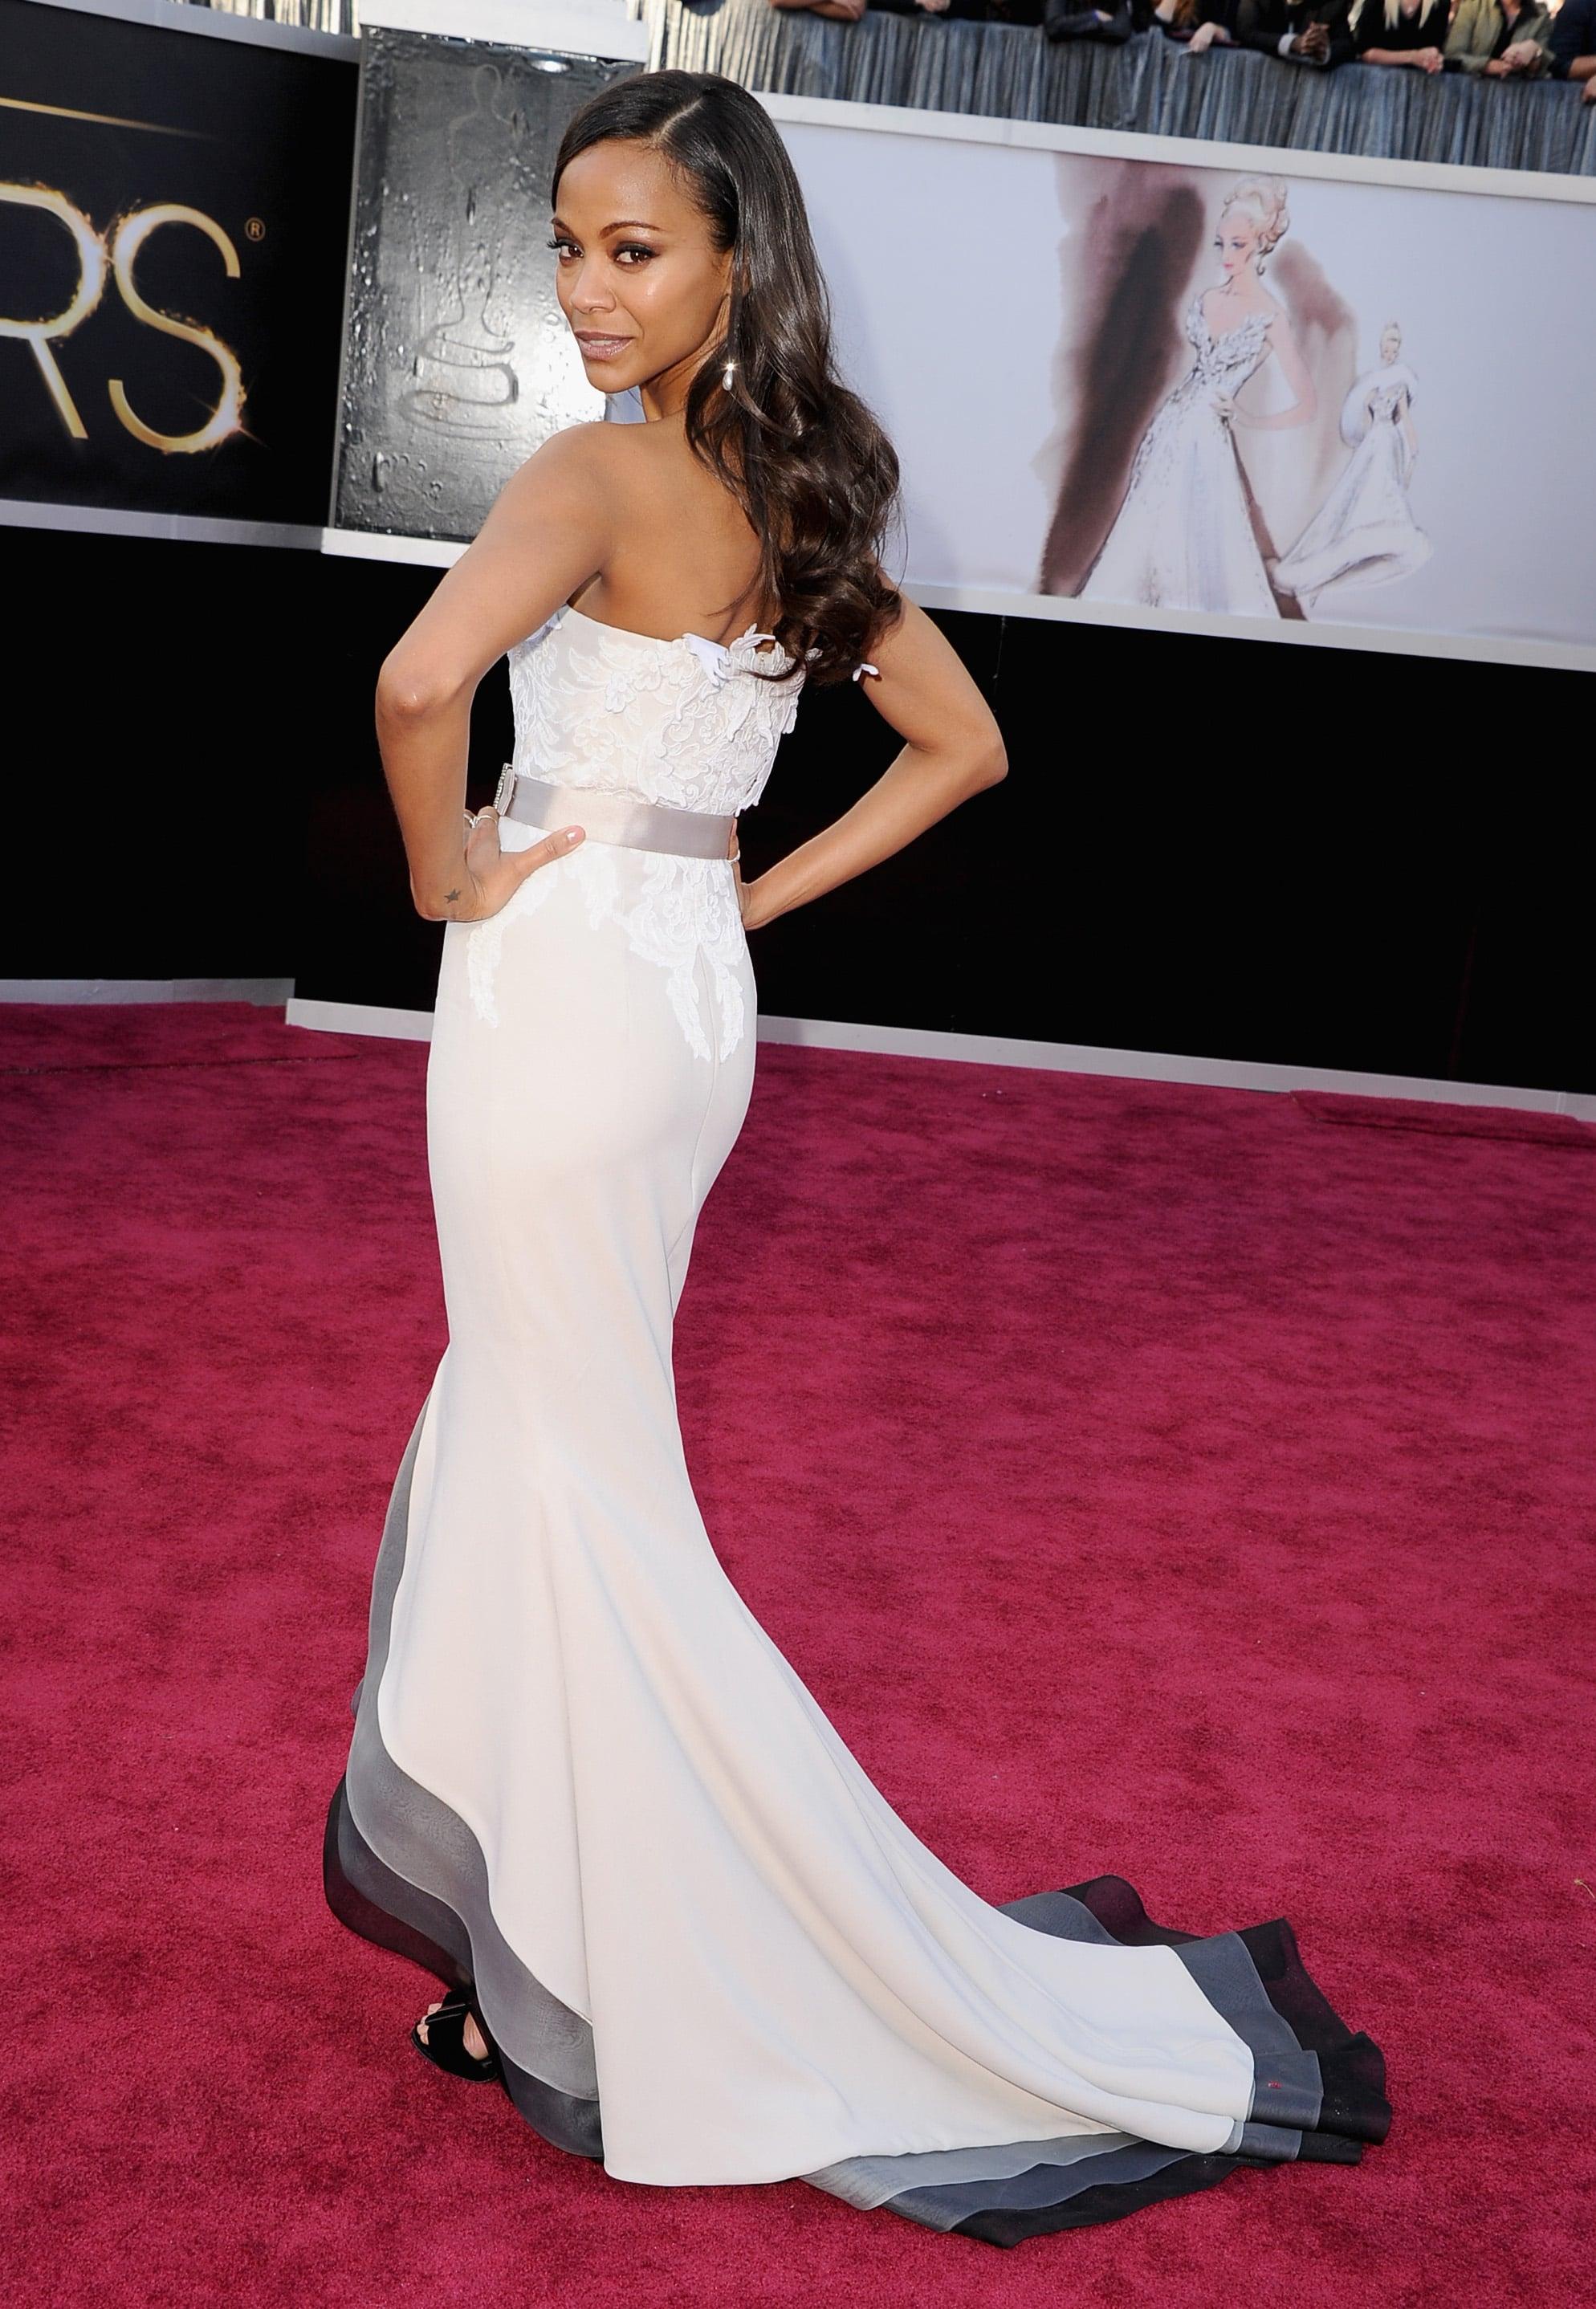 Zoe Saldana on the red carpet at the Oscars 2013.